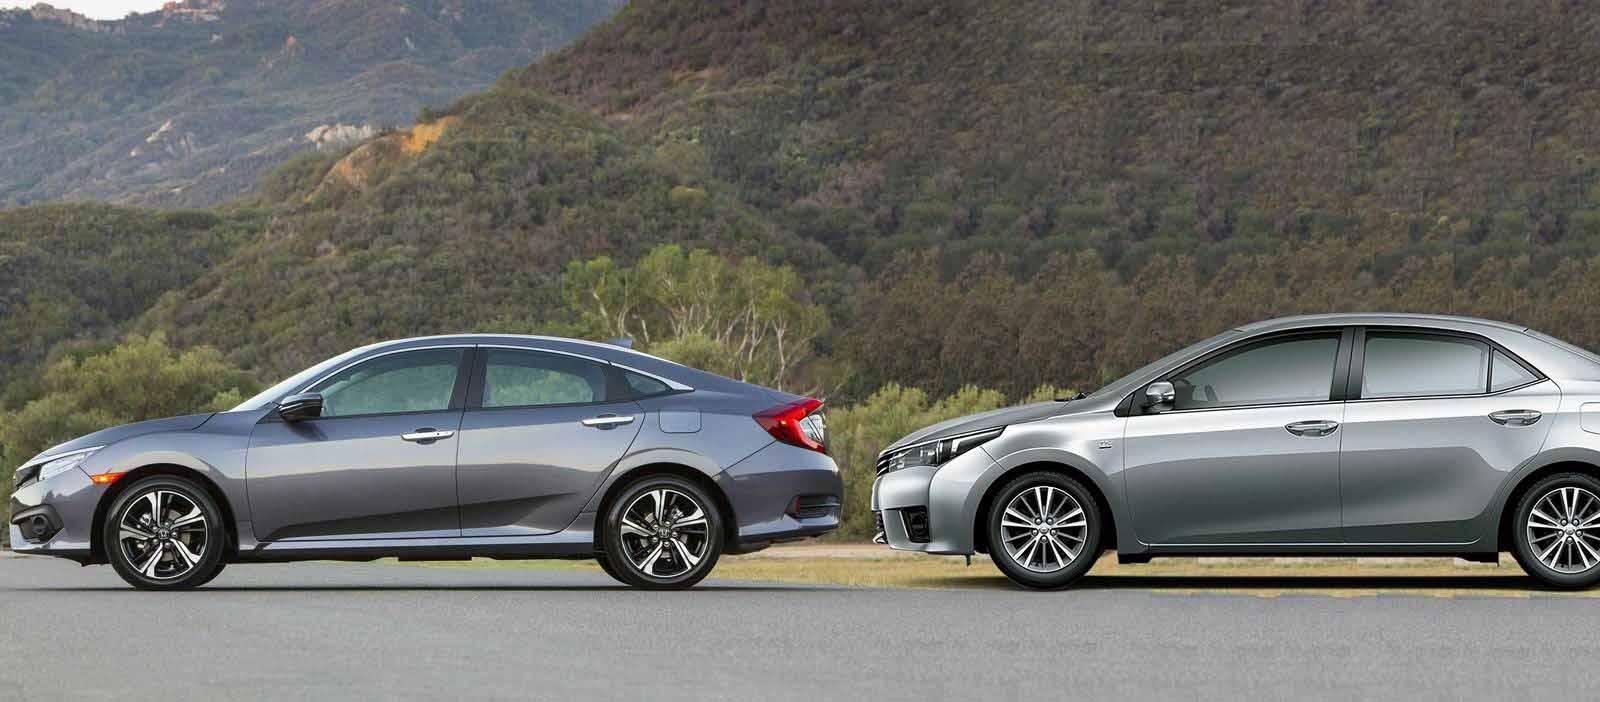 Honda Civic 2017 enfrenta o Toyota Corolla: comparativo ...